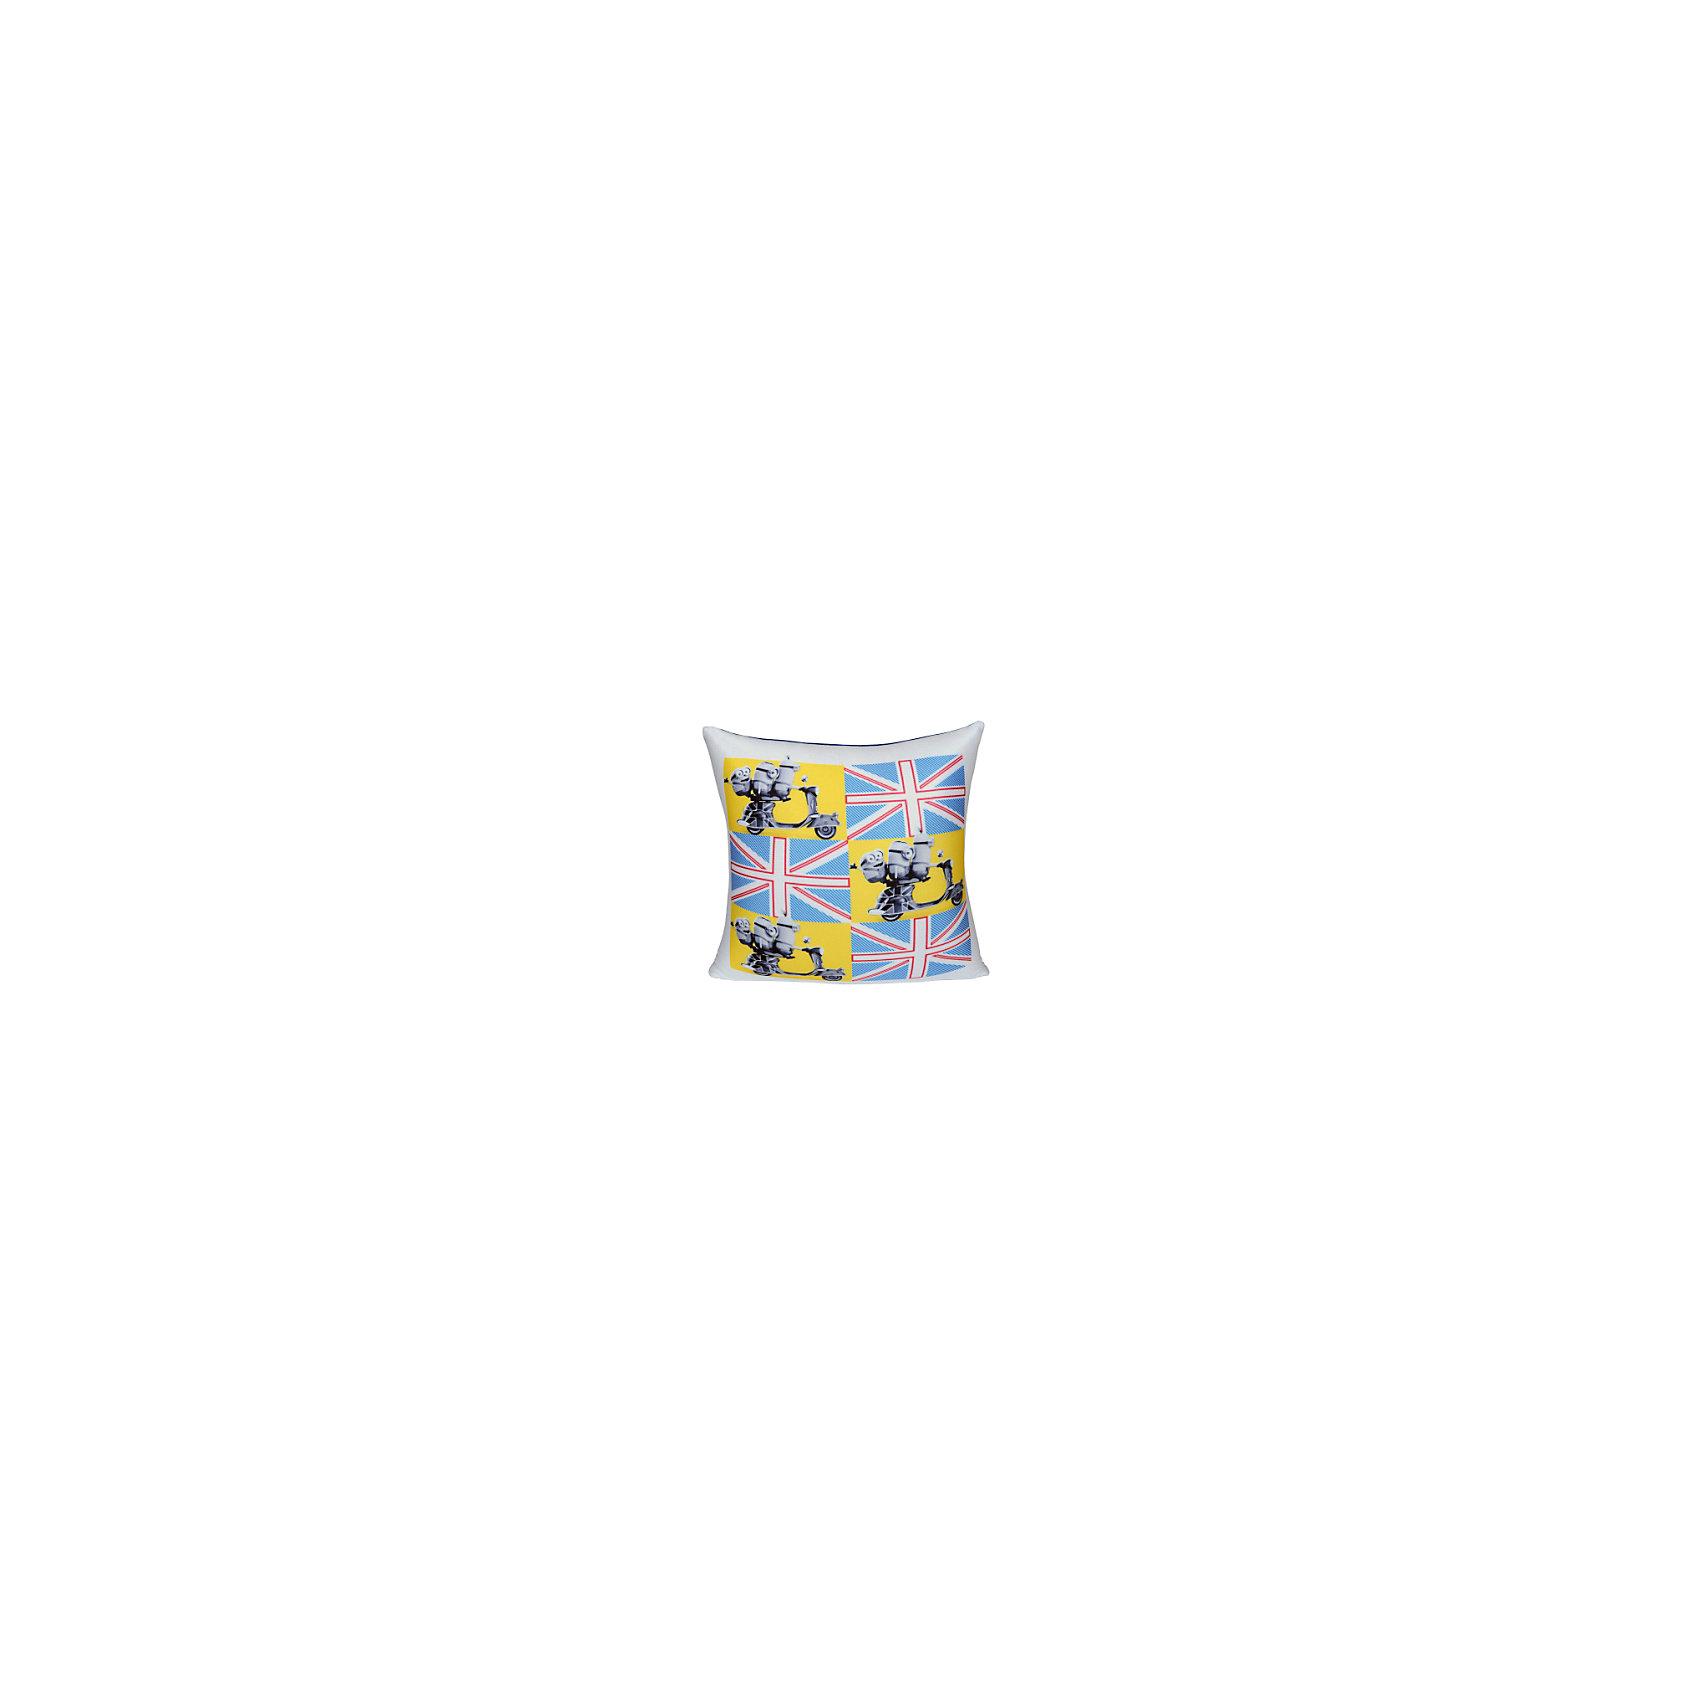 СмолТойс Игрушка-подушка антистресс В31, арт. 2898/ЖЛ/31 смолтойс мягкая игрушка антистресс кевин 20 см